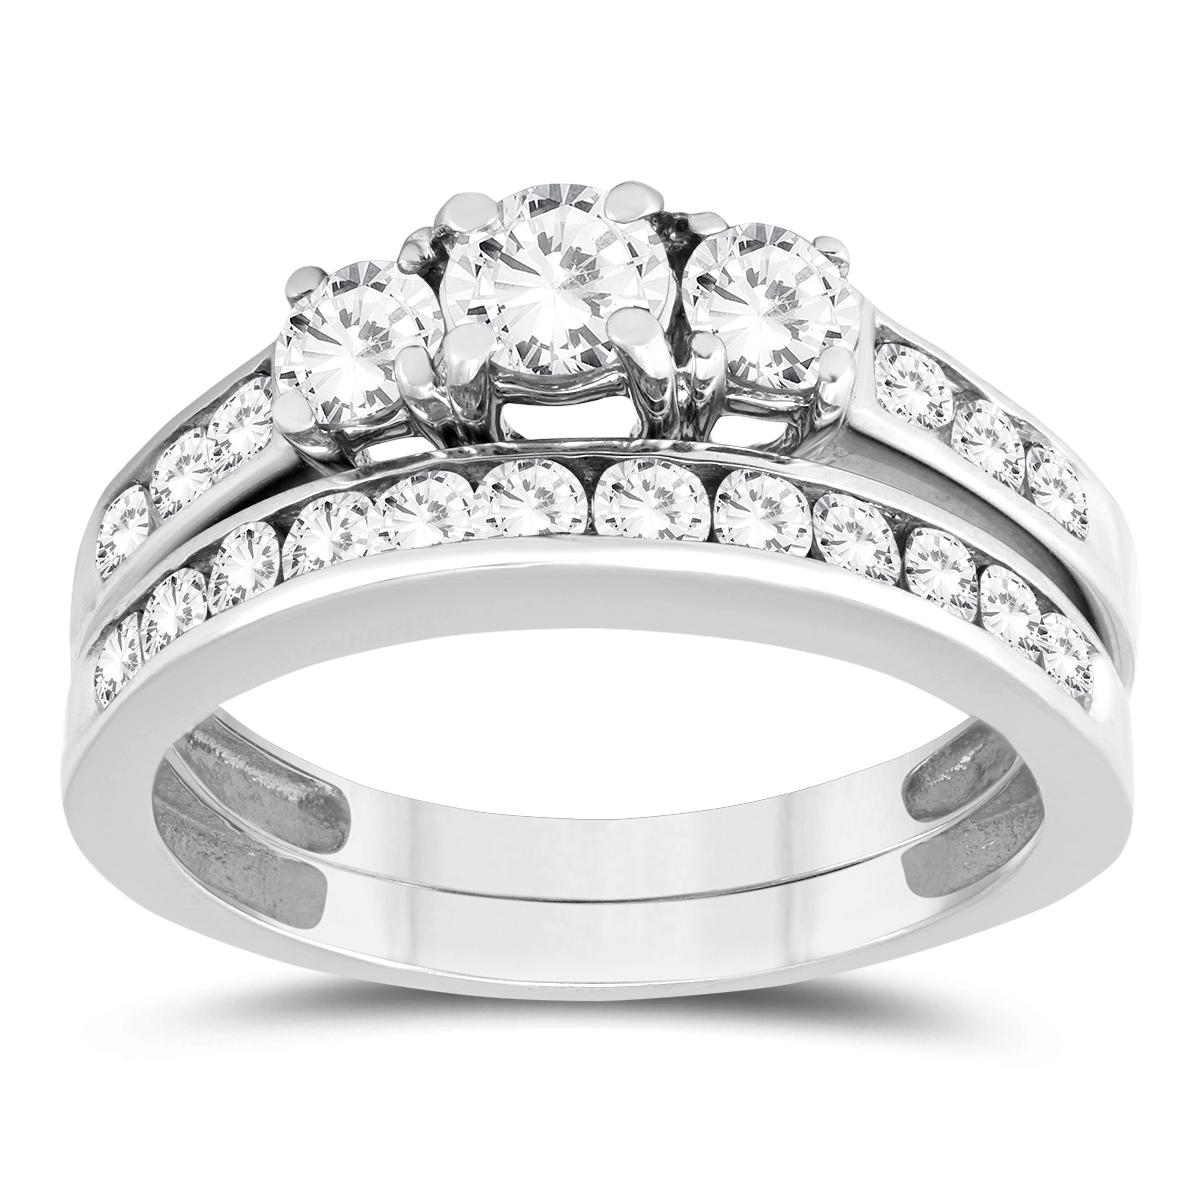 szul.com 1 1/2 Carat Three Stone Diamond Bridal Set in 10K White Gold at Sears.com